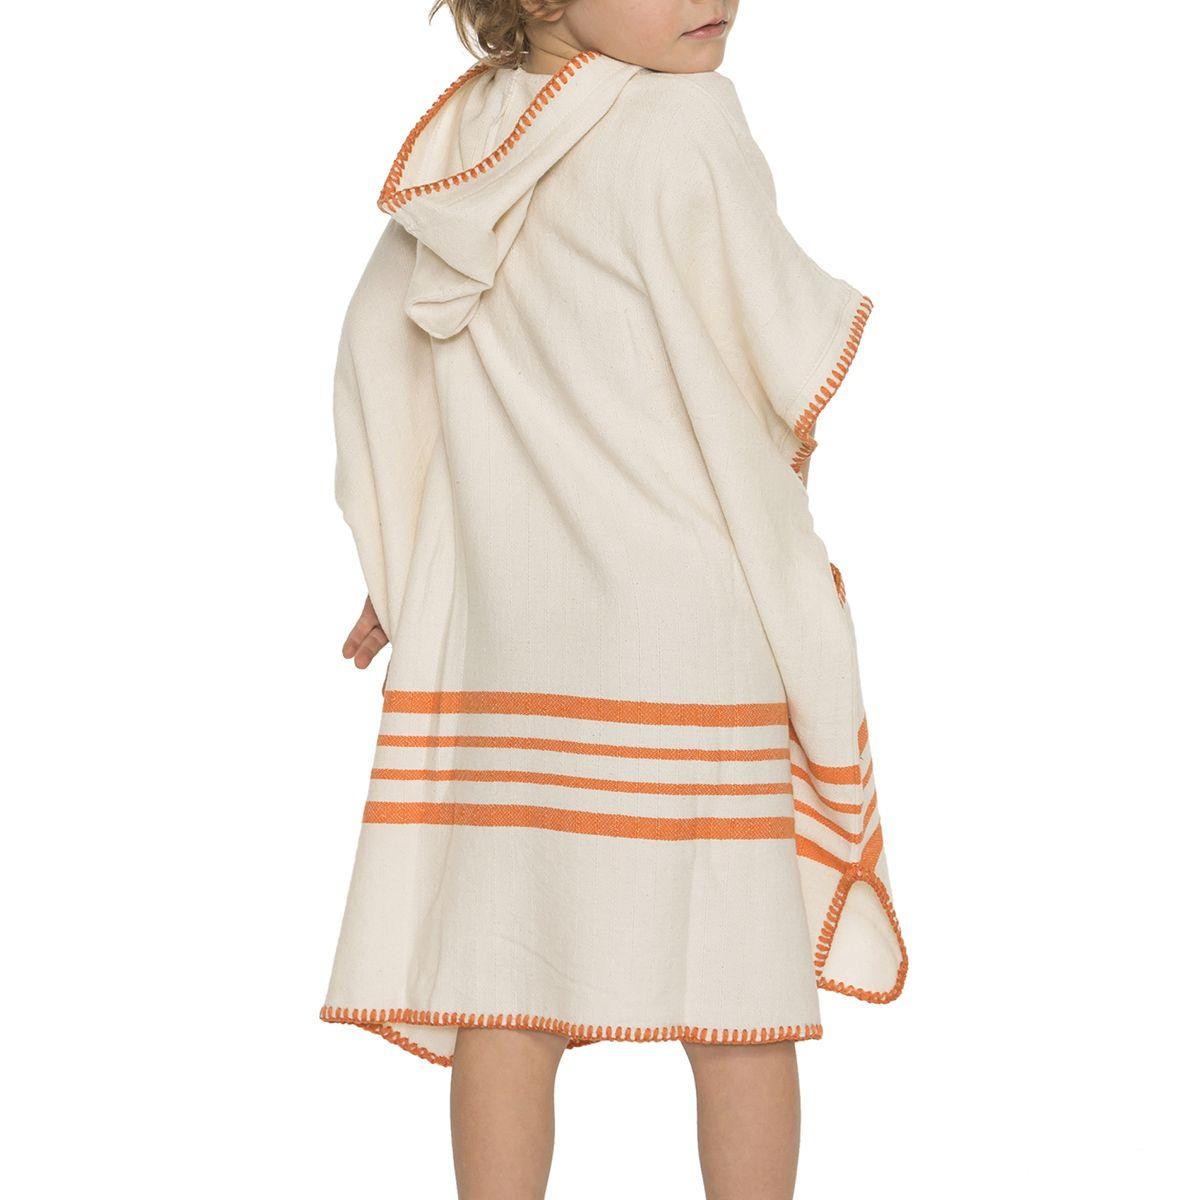 Poncho Kiddo / Sultan - Orange Stripes